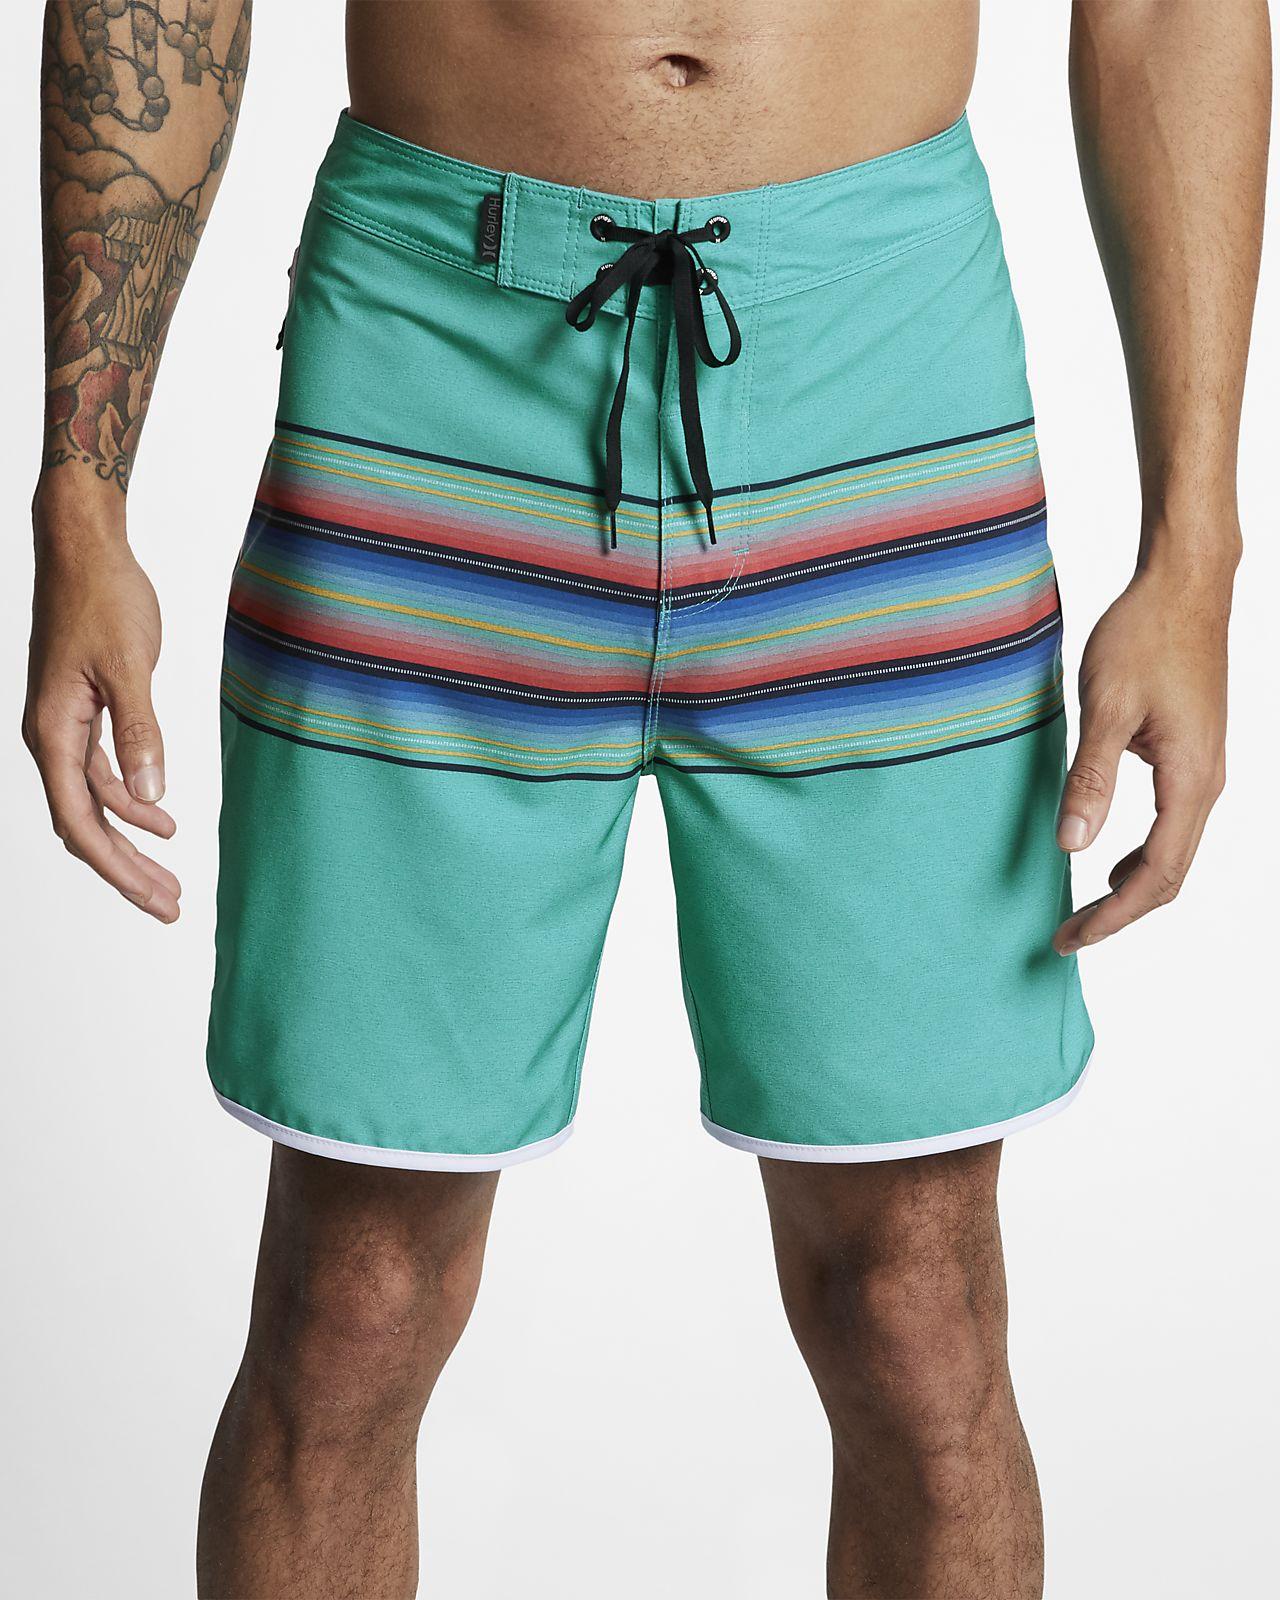 Boardshorty męskie 46 cm Hurley Phantom Baja Malibu